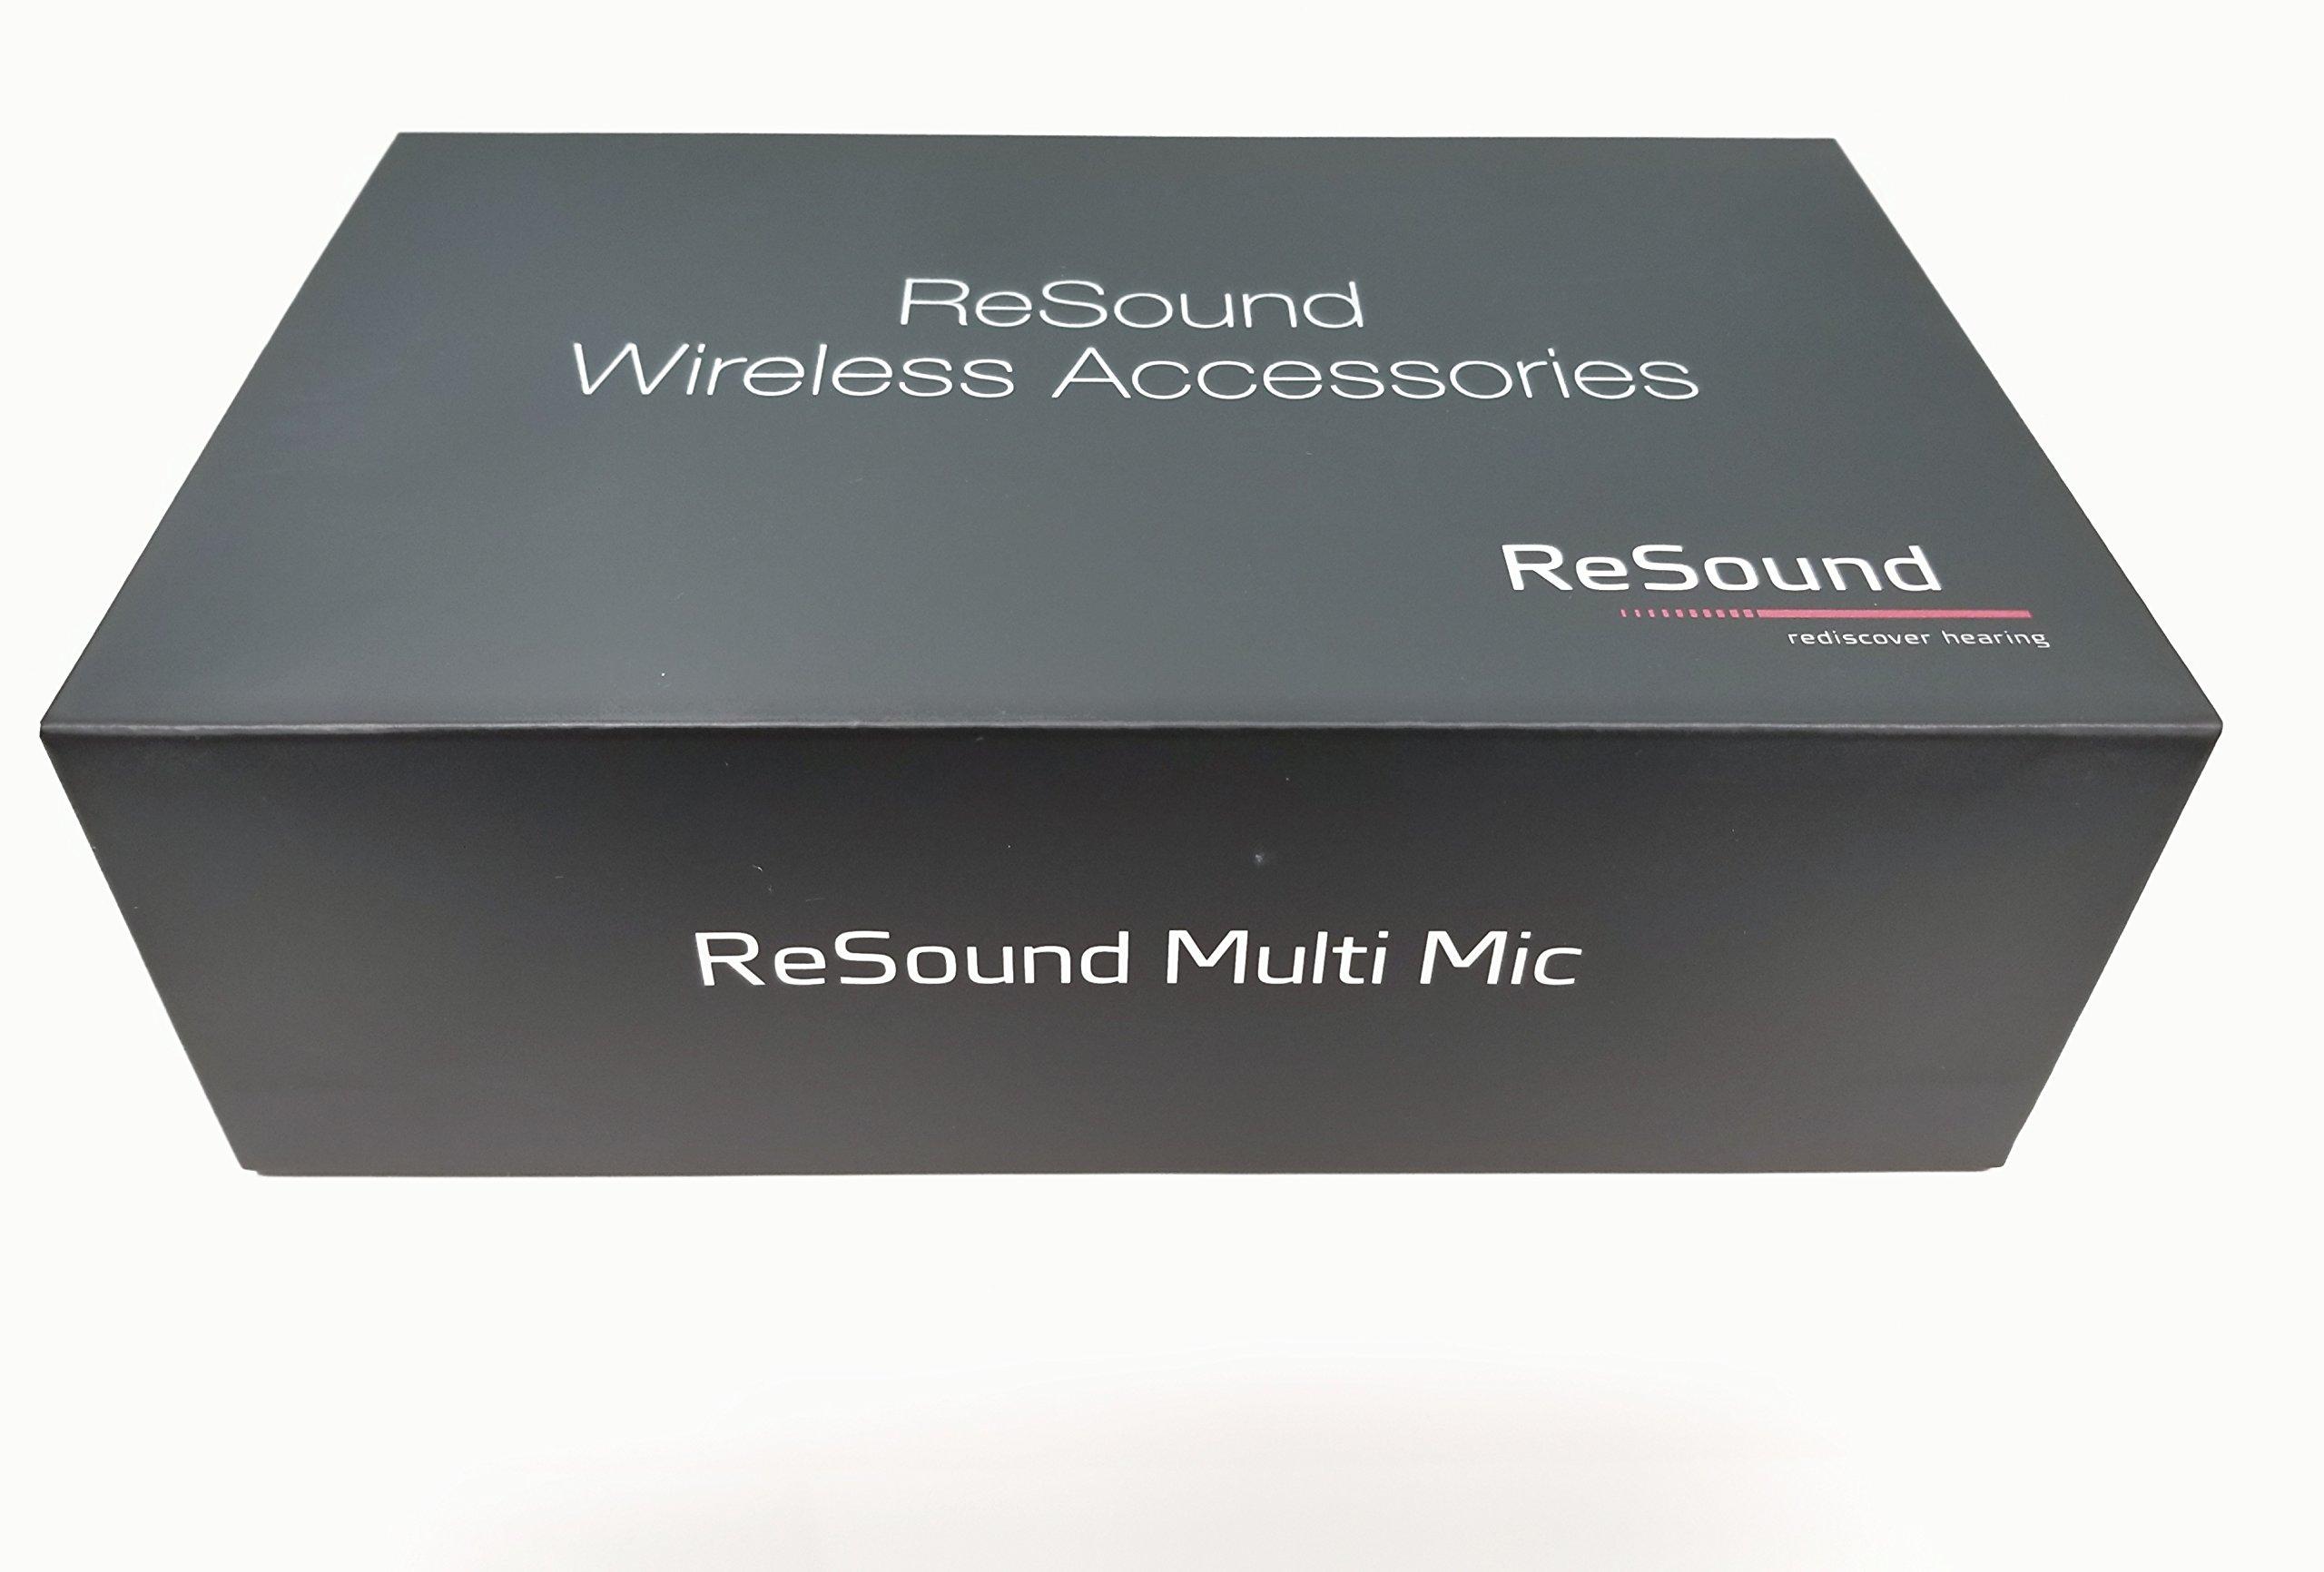 Resound Multi Mic by Resound (Image #5)